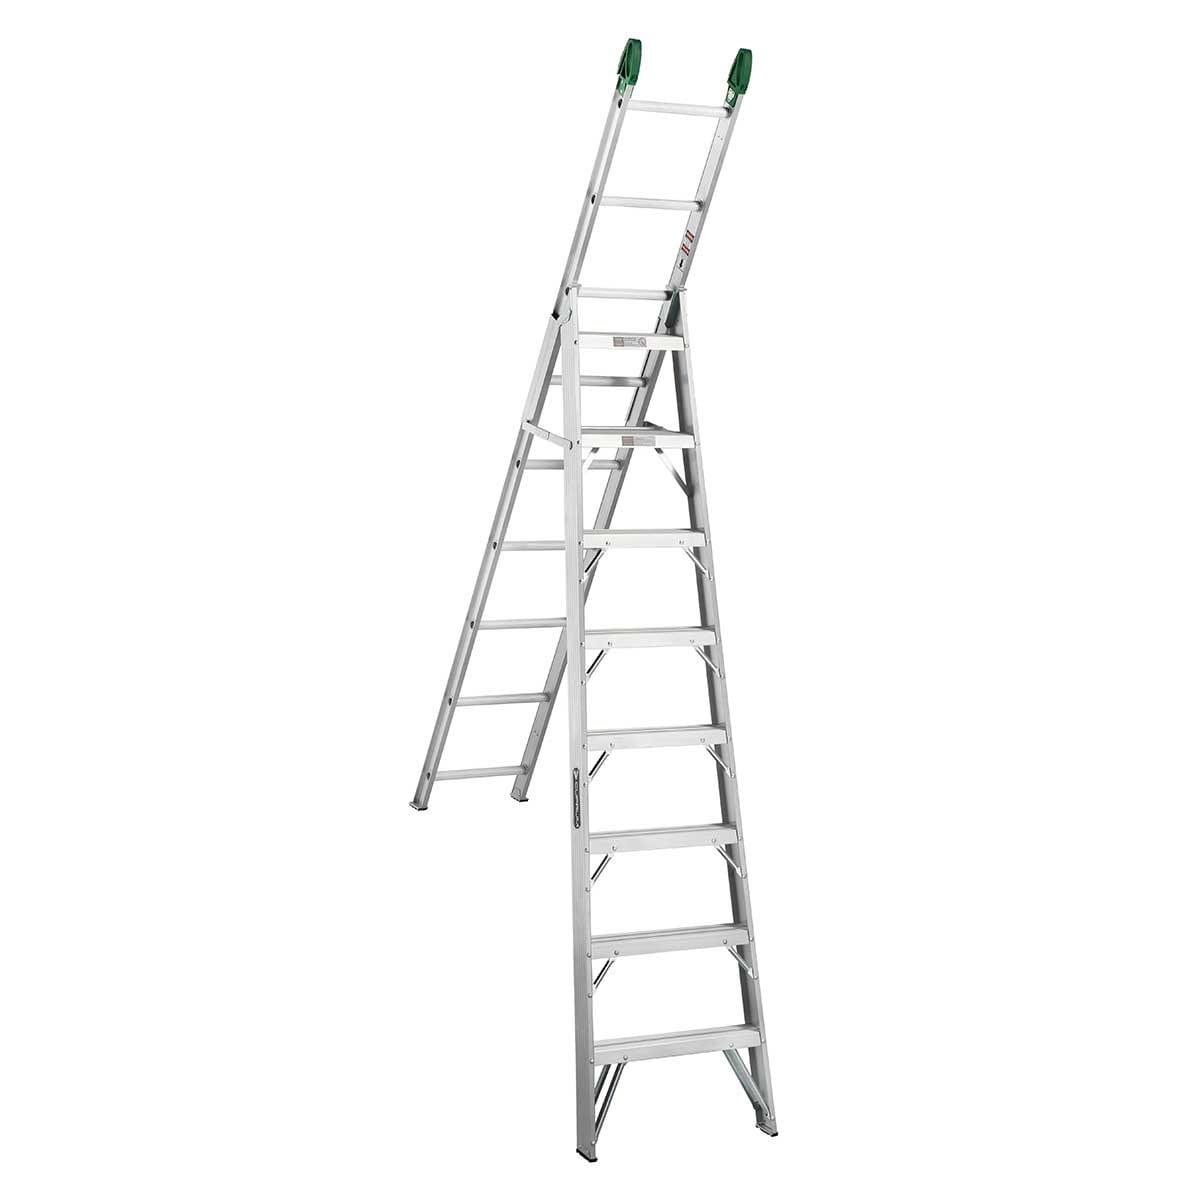 Escalera Convertible de Aluminio (17 Escalones) Cuprum C-2287-17